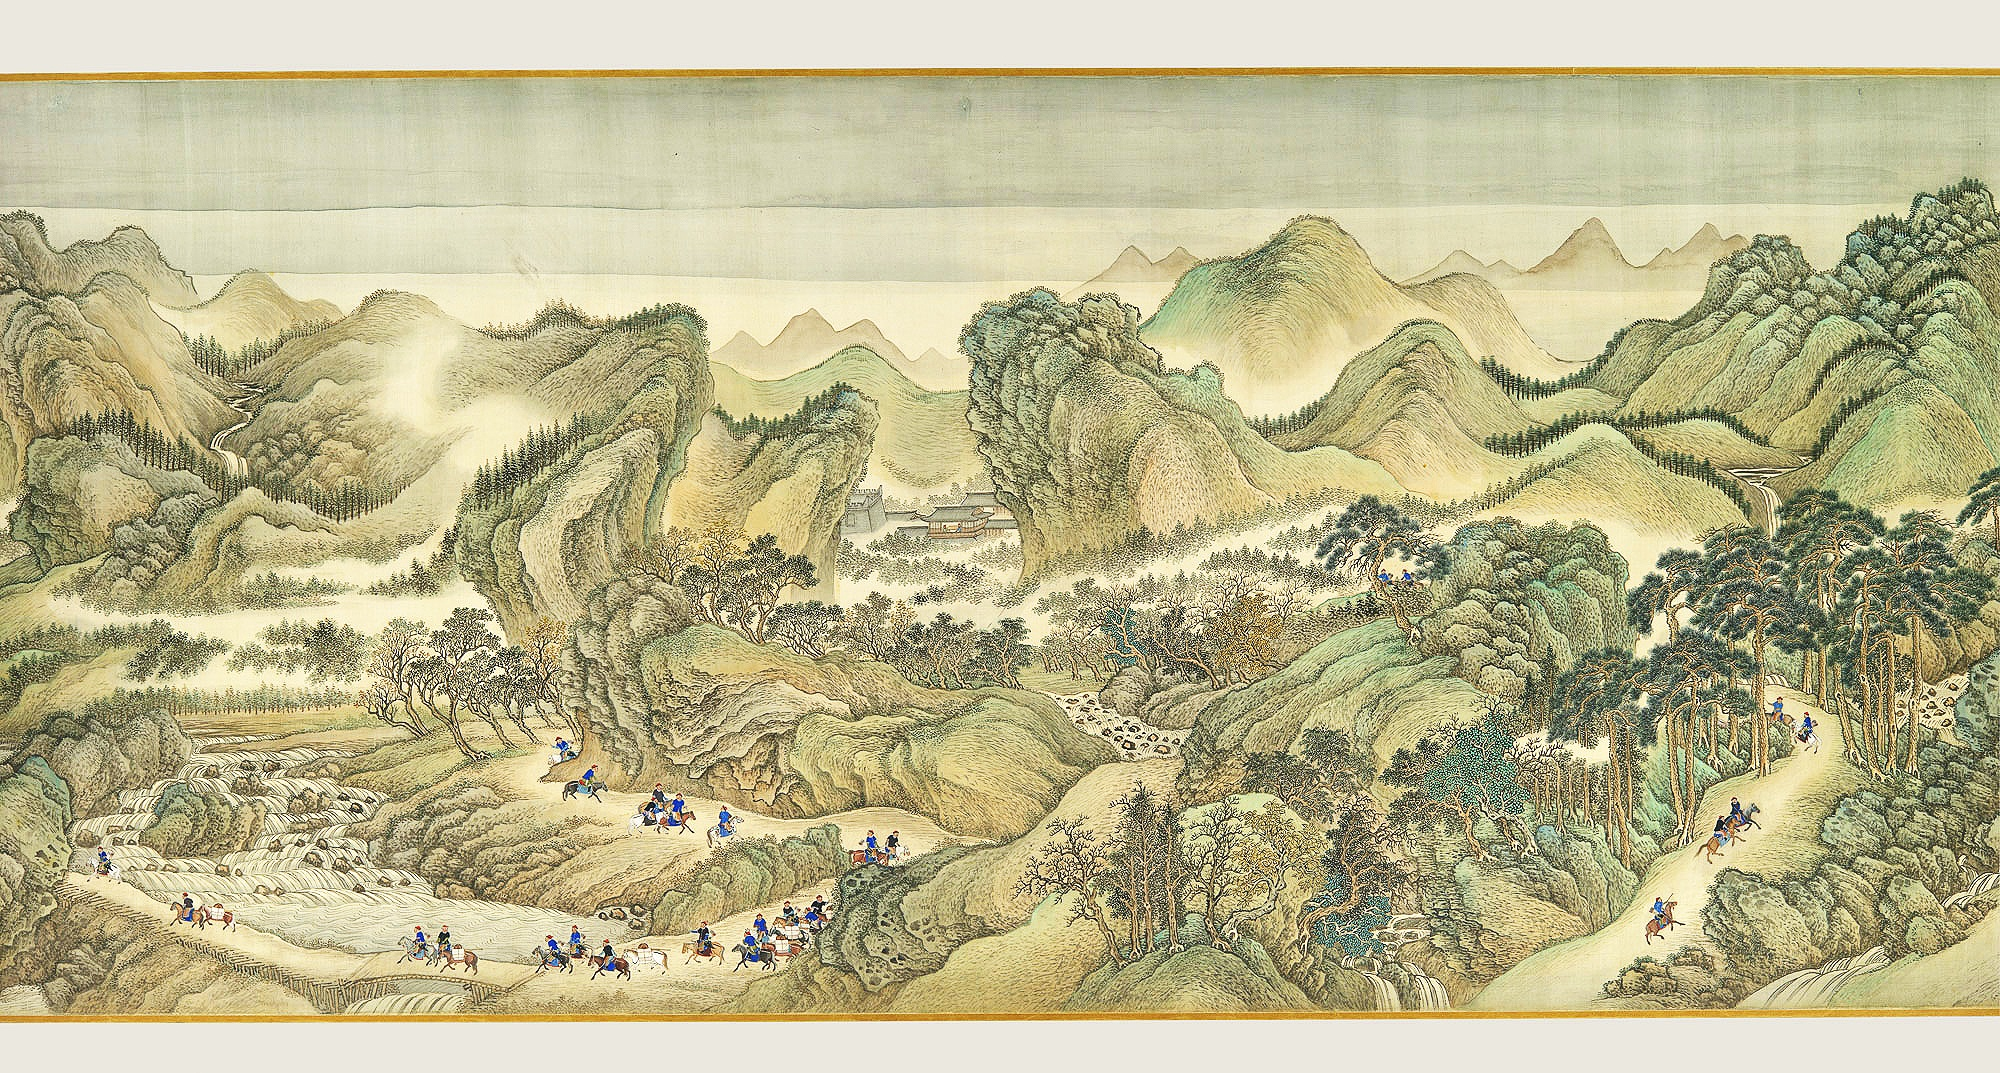 ( The Kangxi Emperor's Southern Inspection Tour, Scroll Three: Ji'nan to Mount Tai , by Wang Hui and assistants)